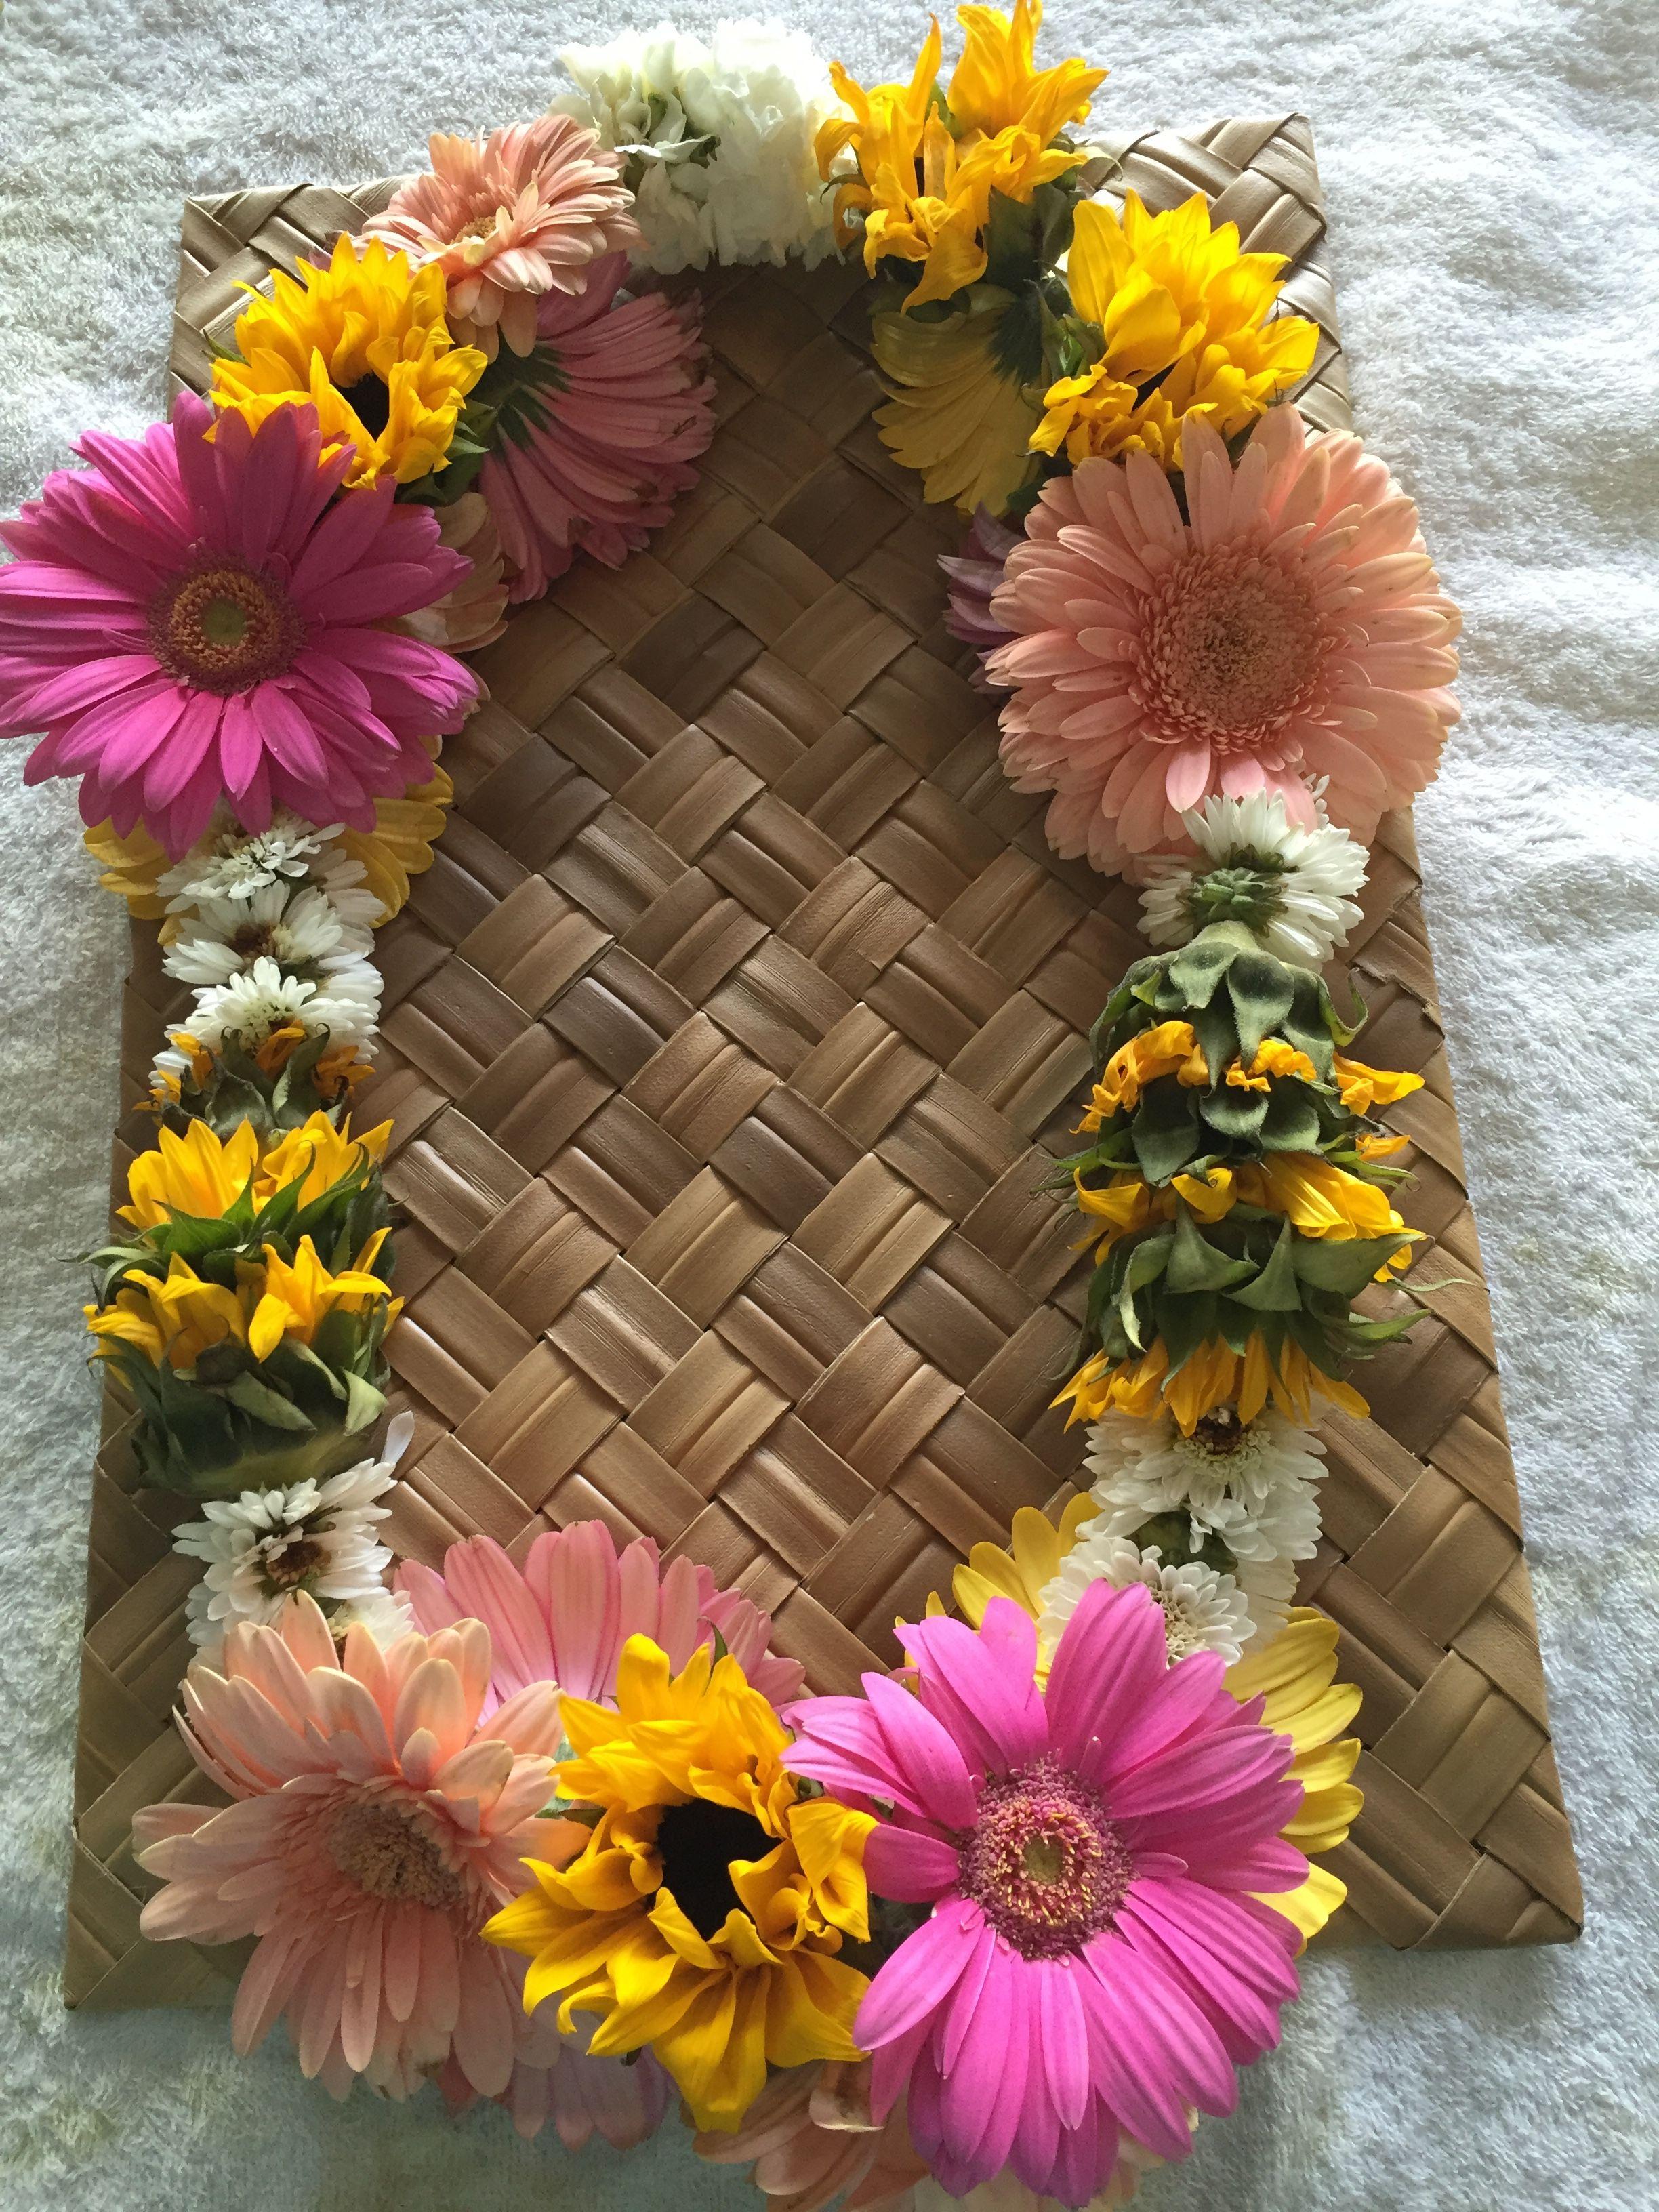 Sunflower lei hawaiian leis pinterest sunflowers leis and cap sunflower lei izmirmasajfo